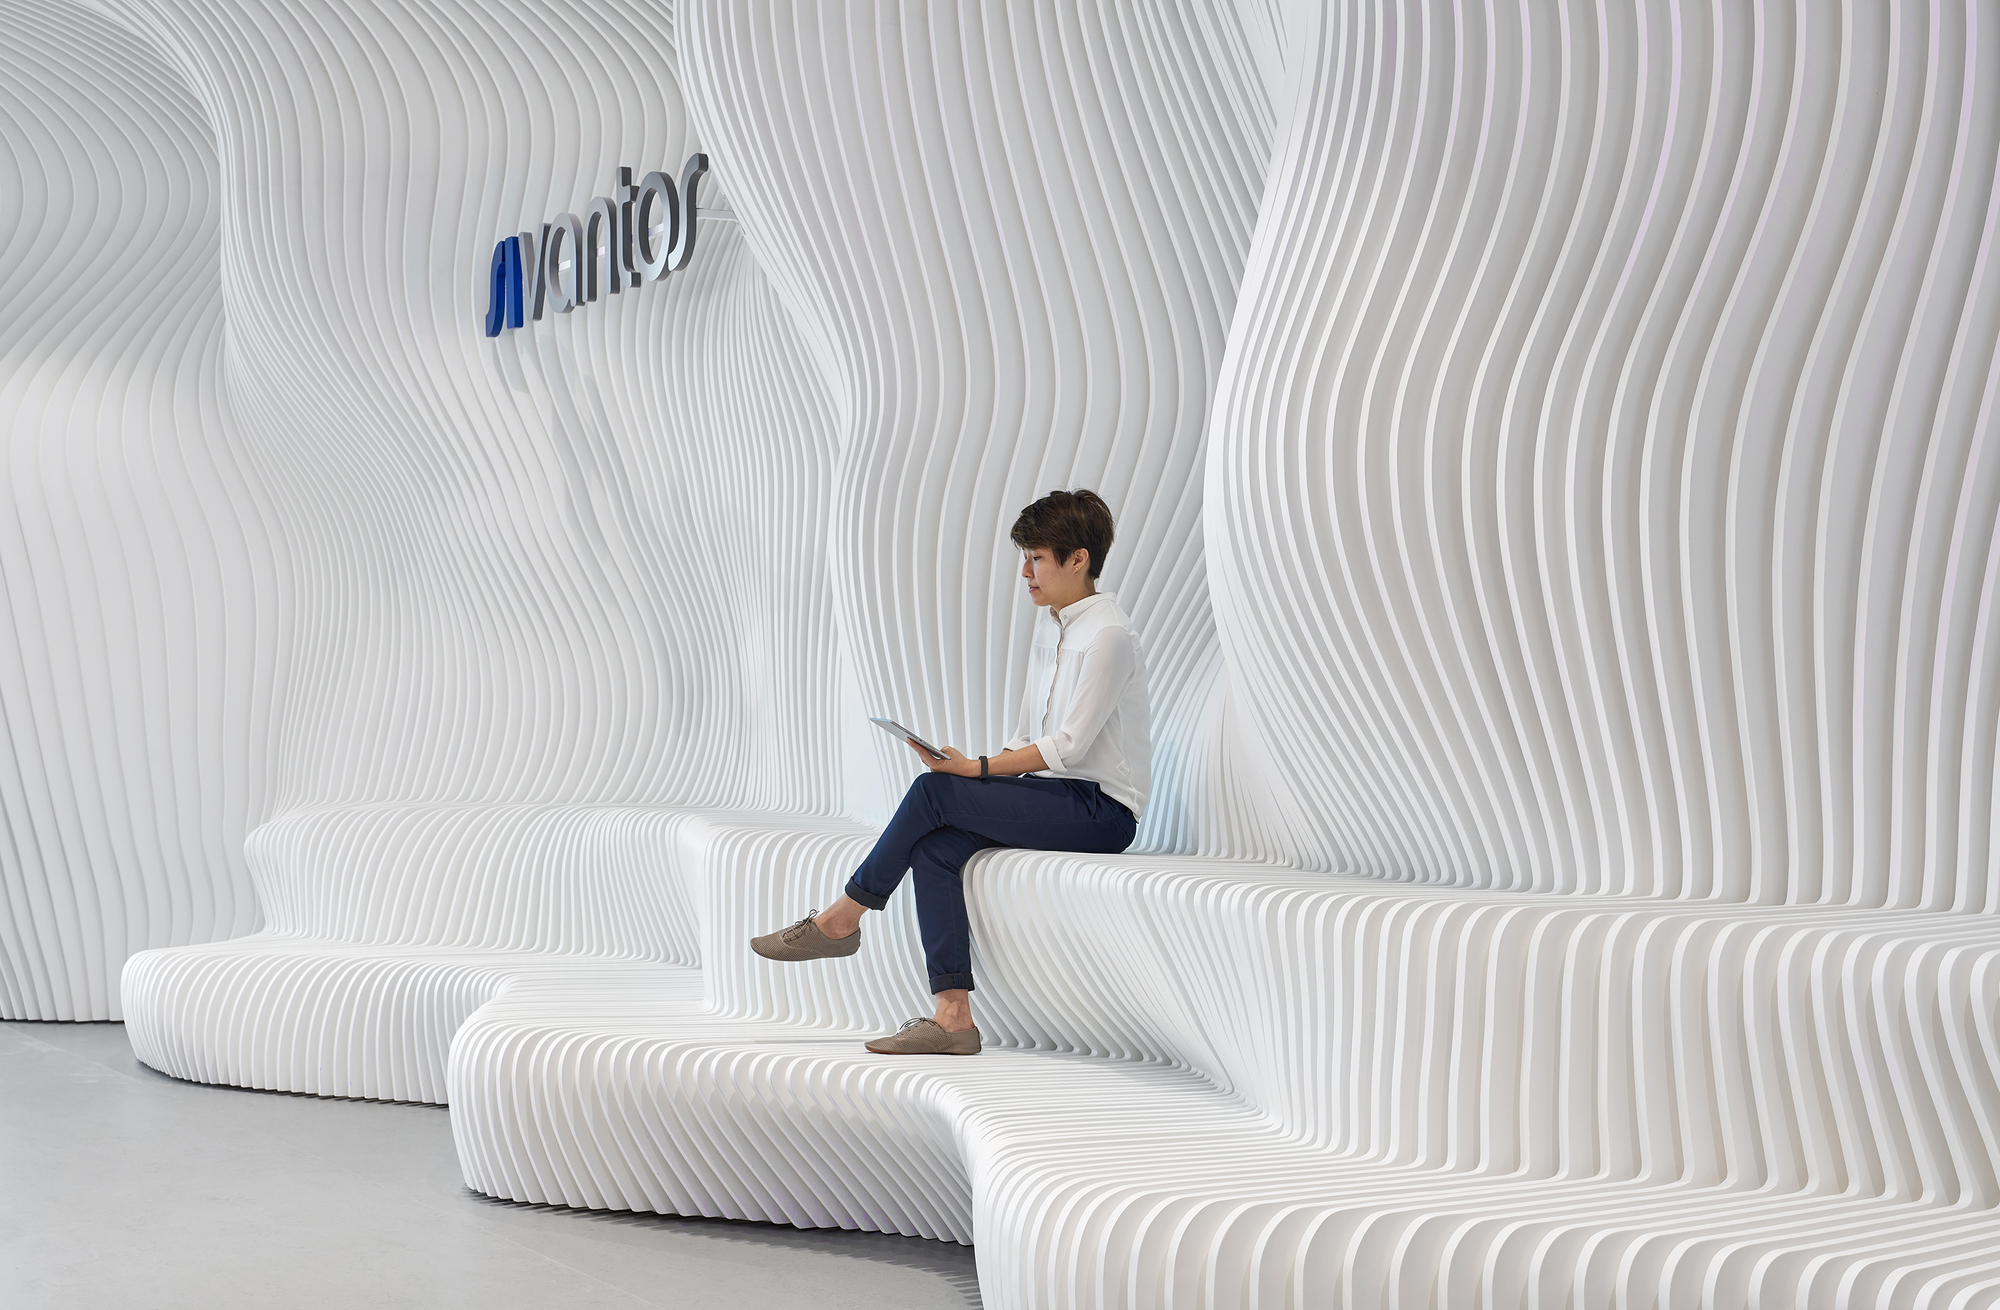 Sivantos Singapore / PLH Arkitekter